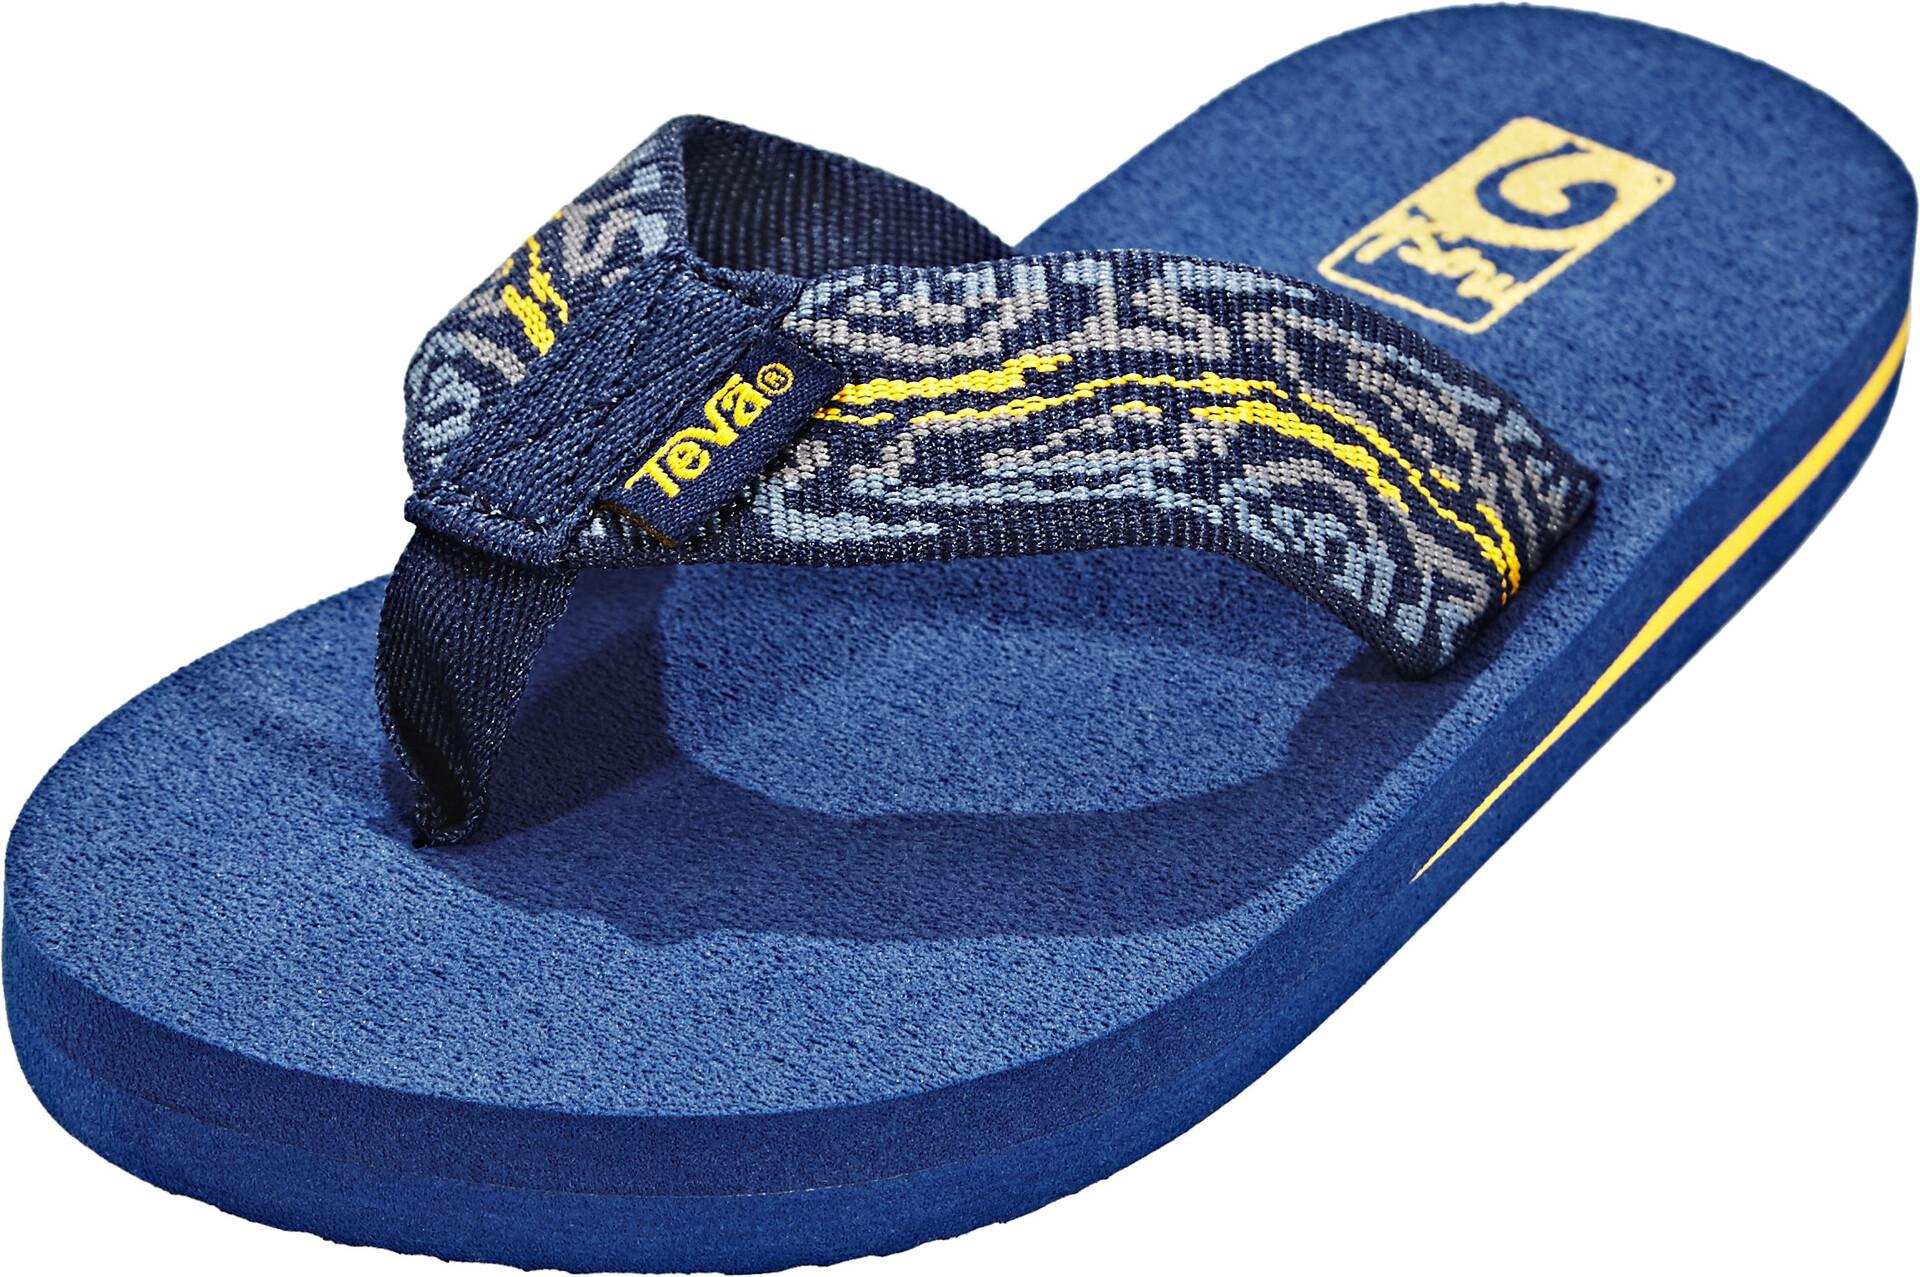 Teva Mush Sandals Flip flop Review